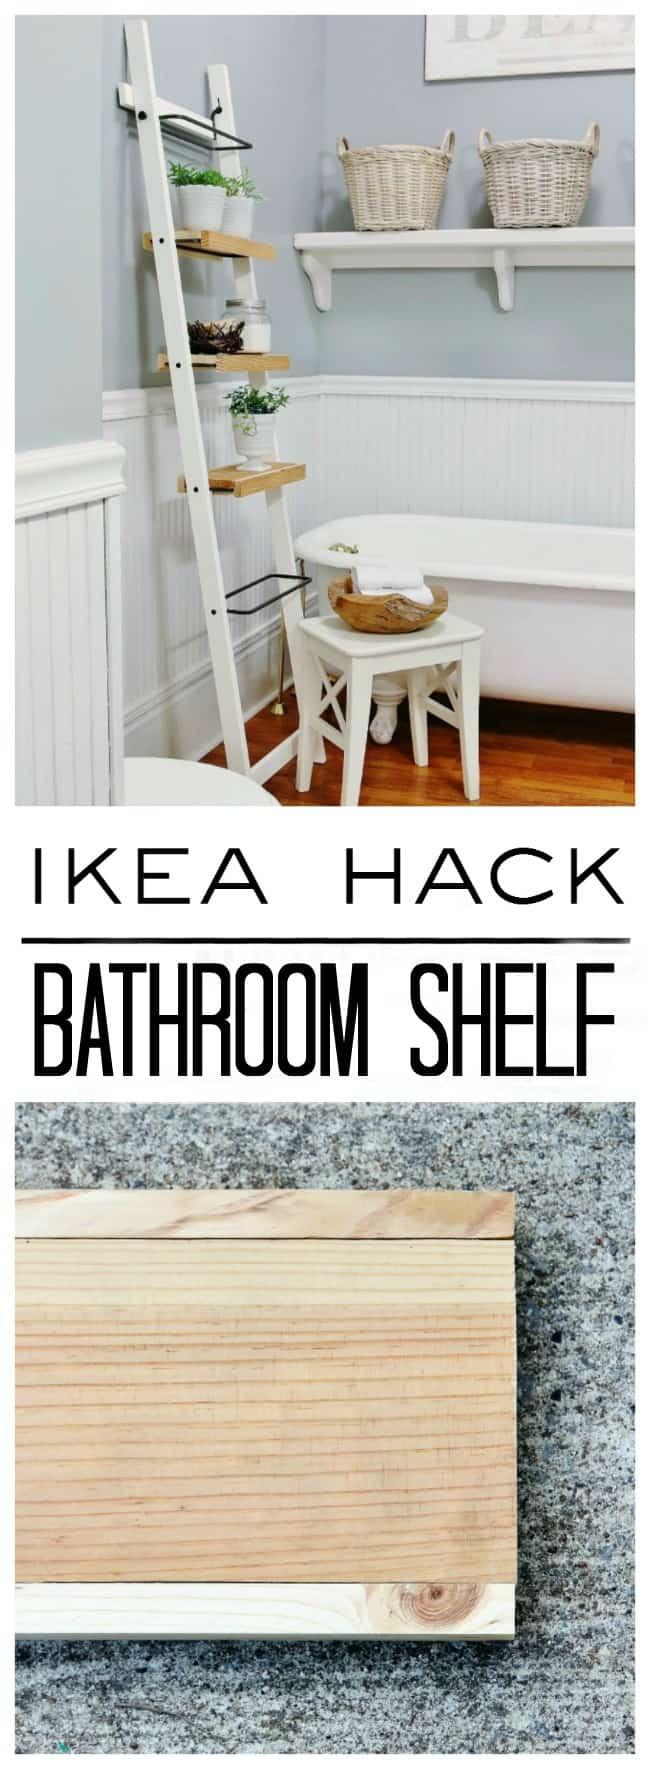 Diy Ikea Bathroom Shelf Hack Thistlewood Farm